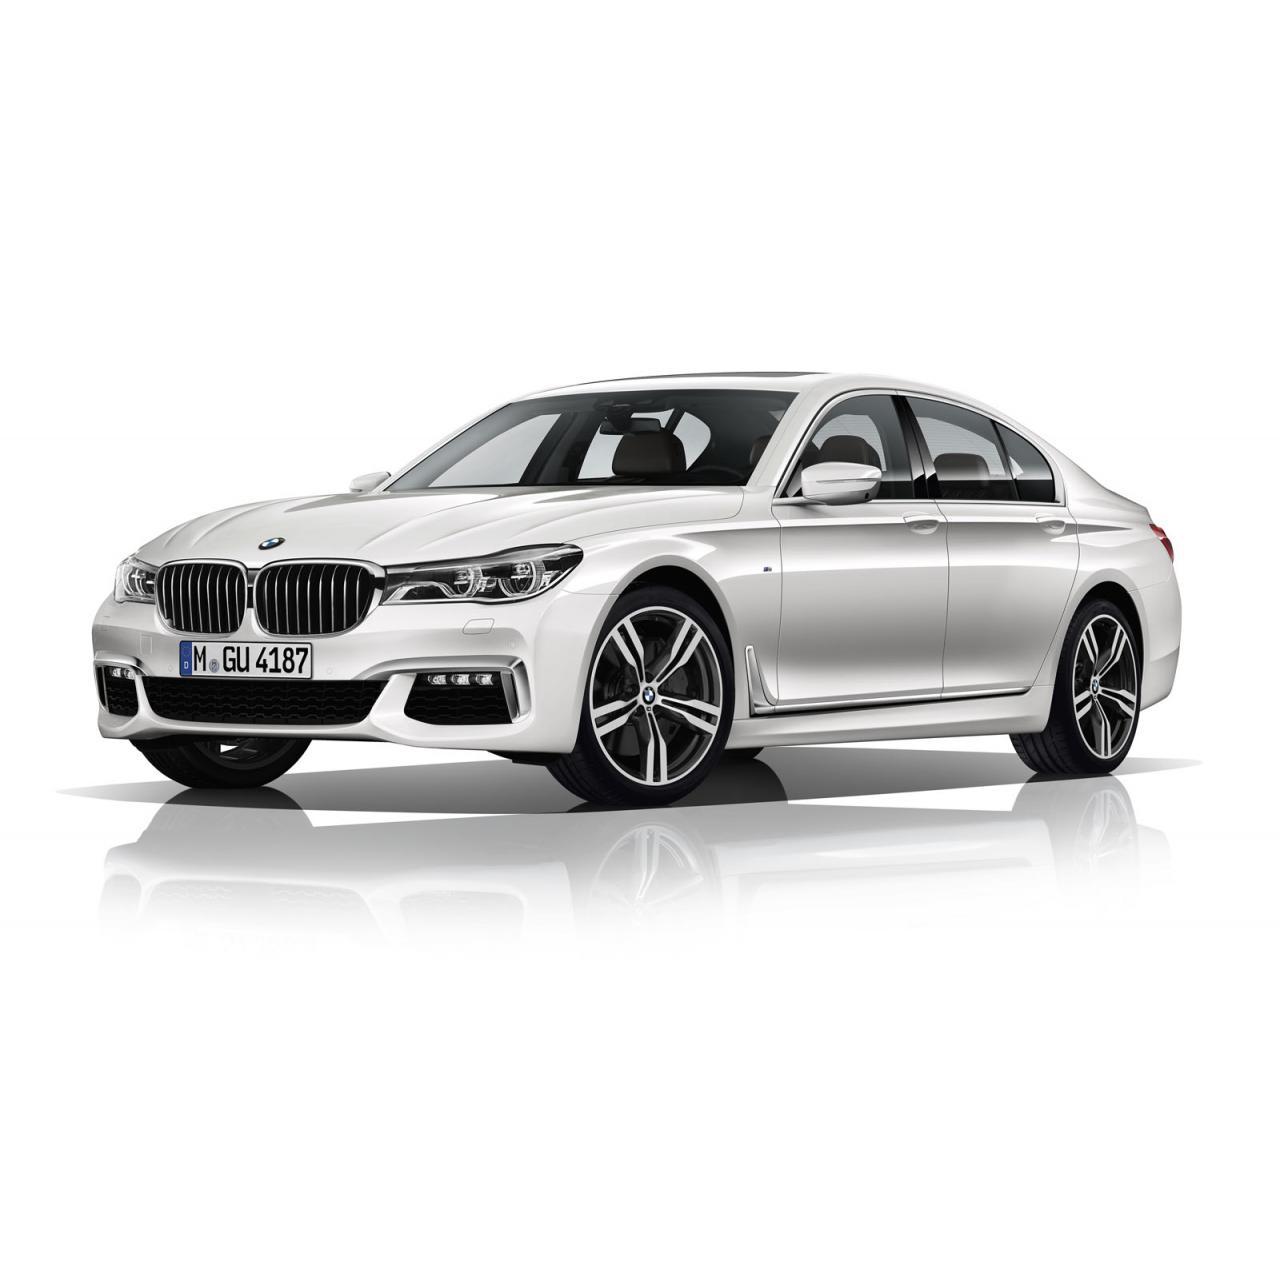 BMW 7-Series 2016 M Sport white/белый front side view/спереди сбоку